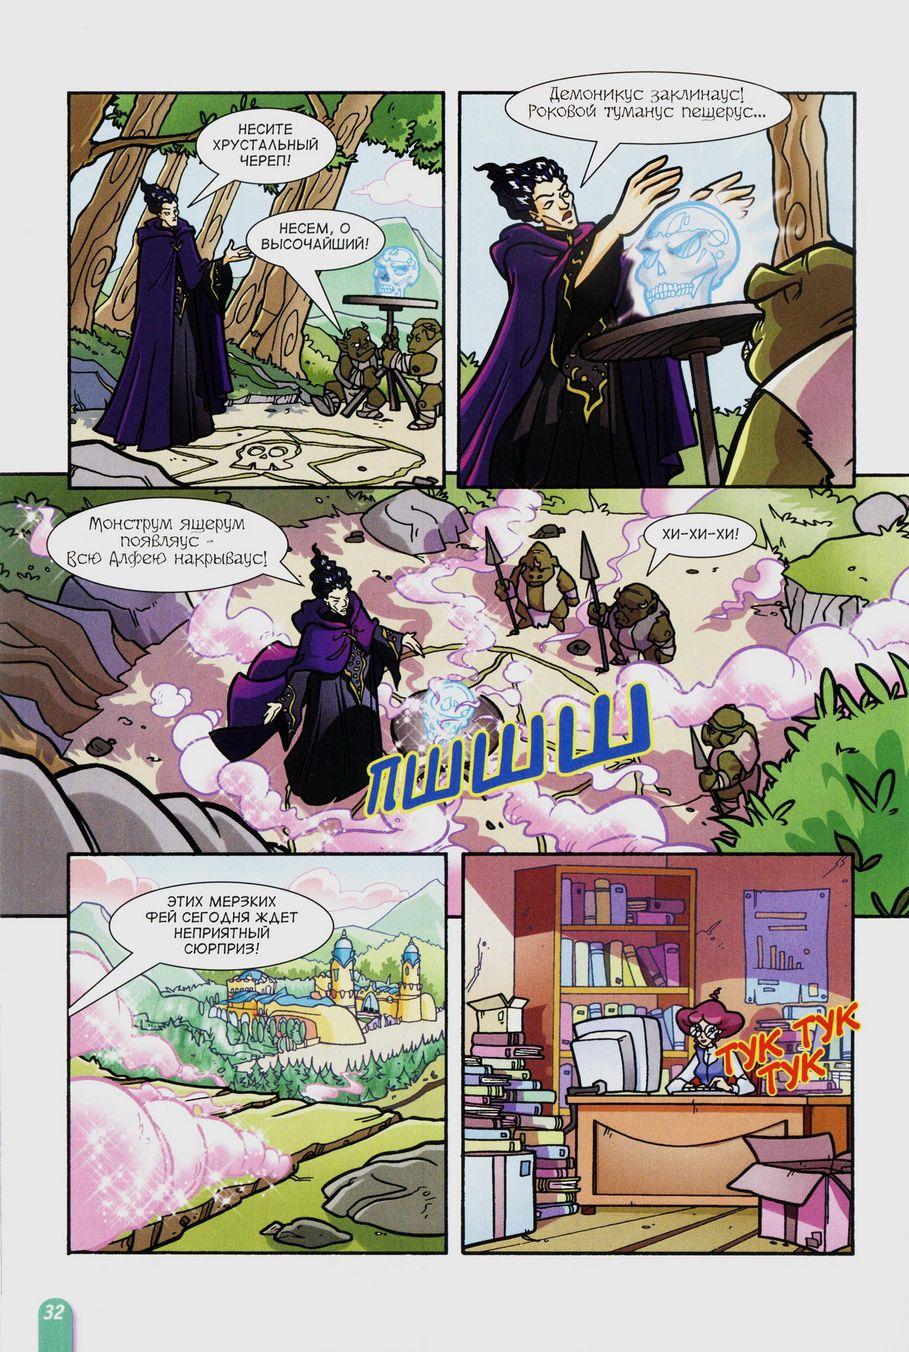 Комикс Винкс Winx - Волшебник Камуд (Журнал Винкс №6 2011) - стр. 32